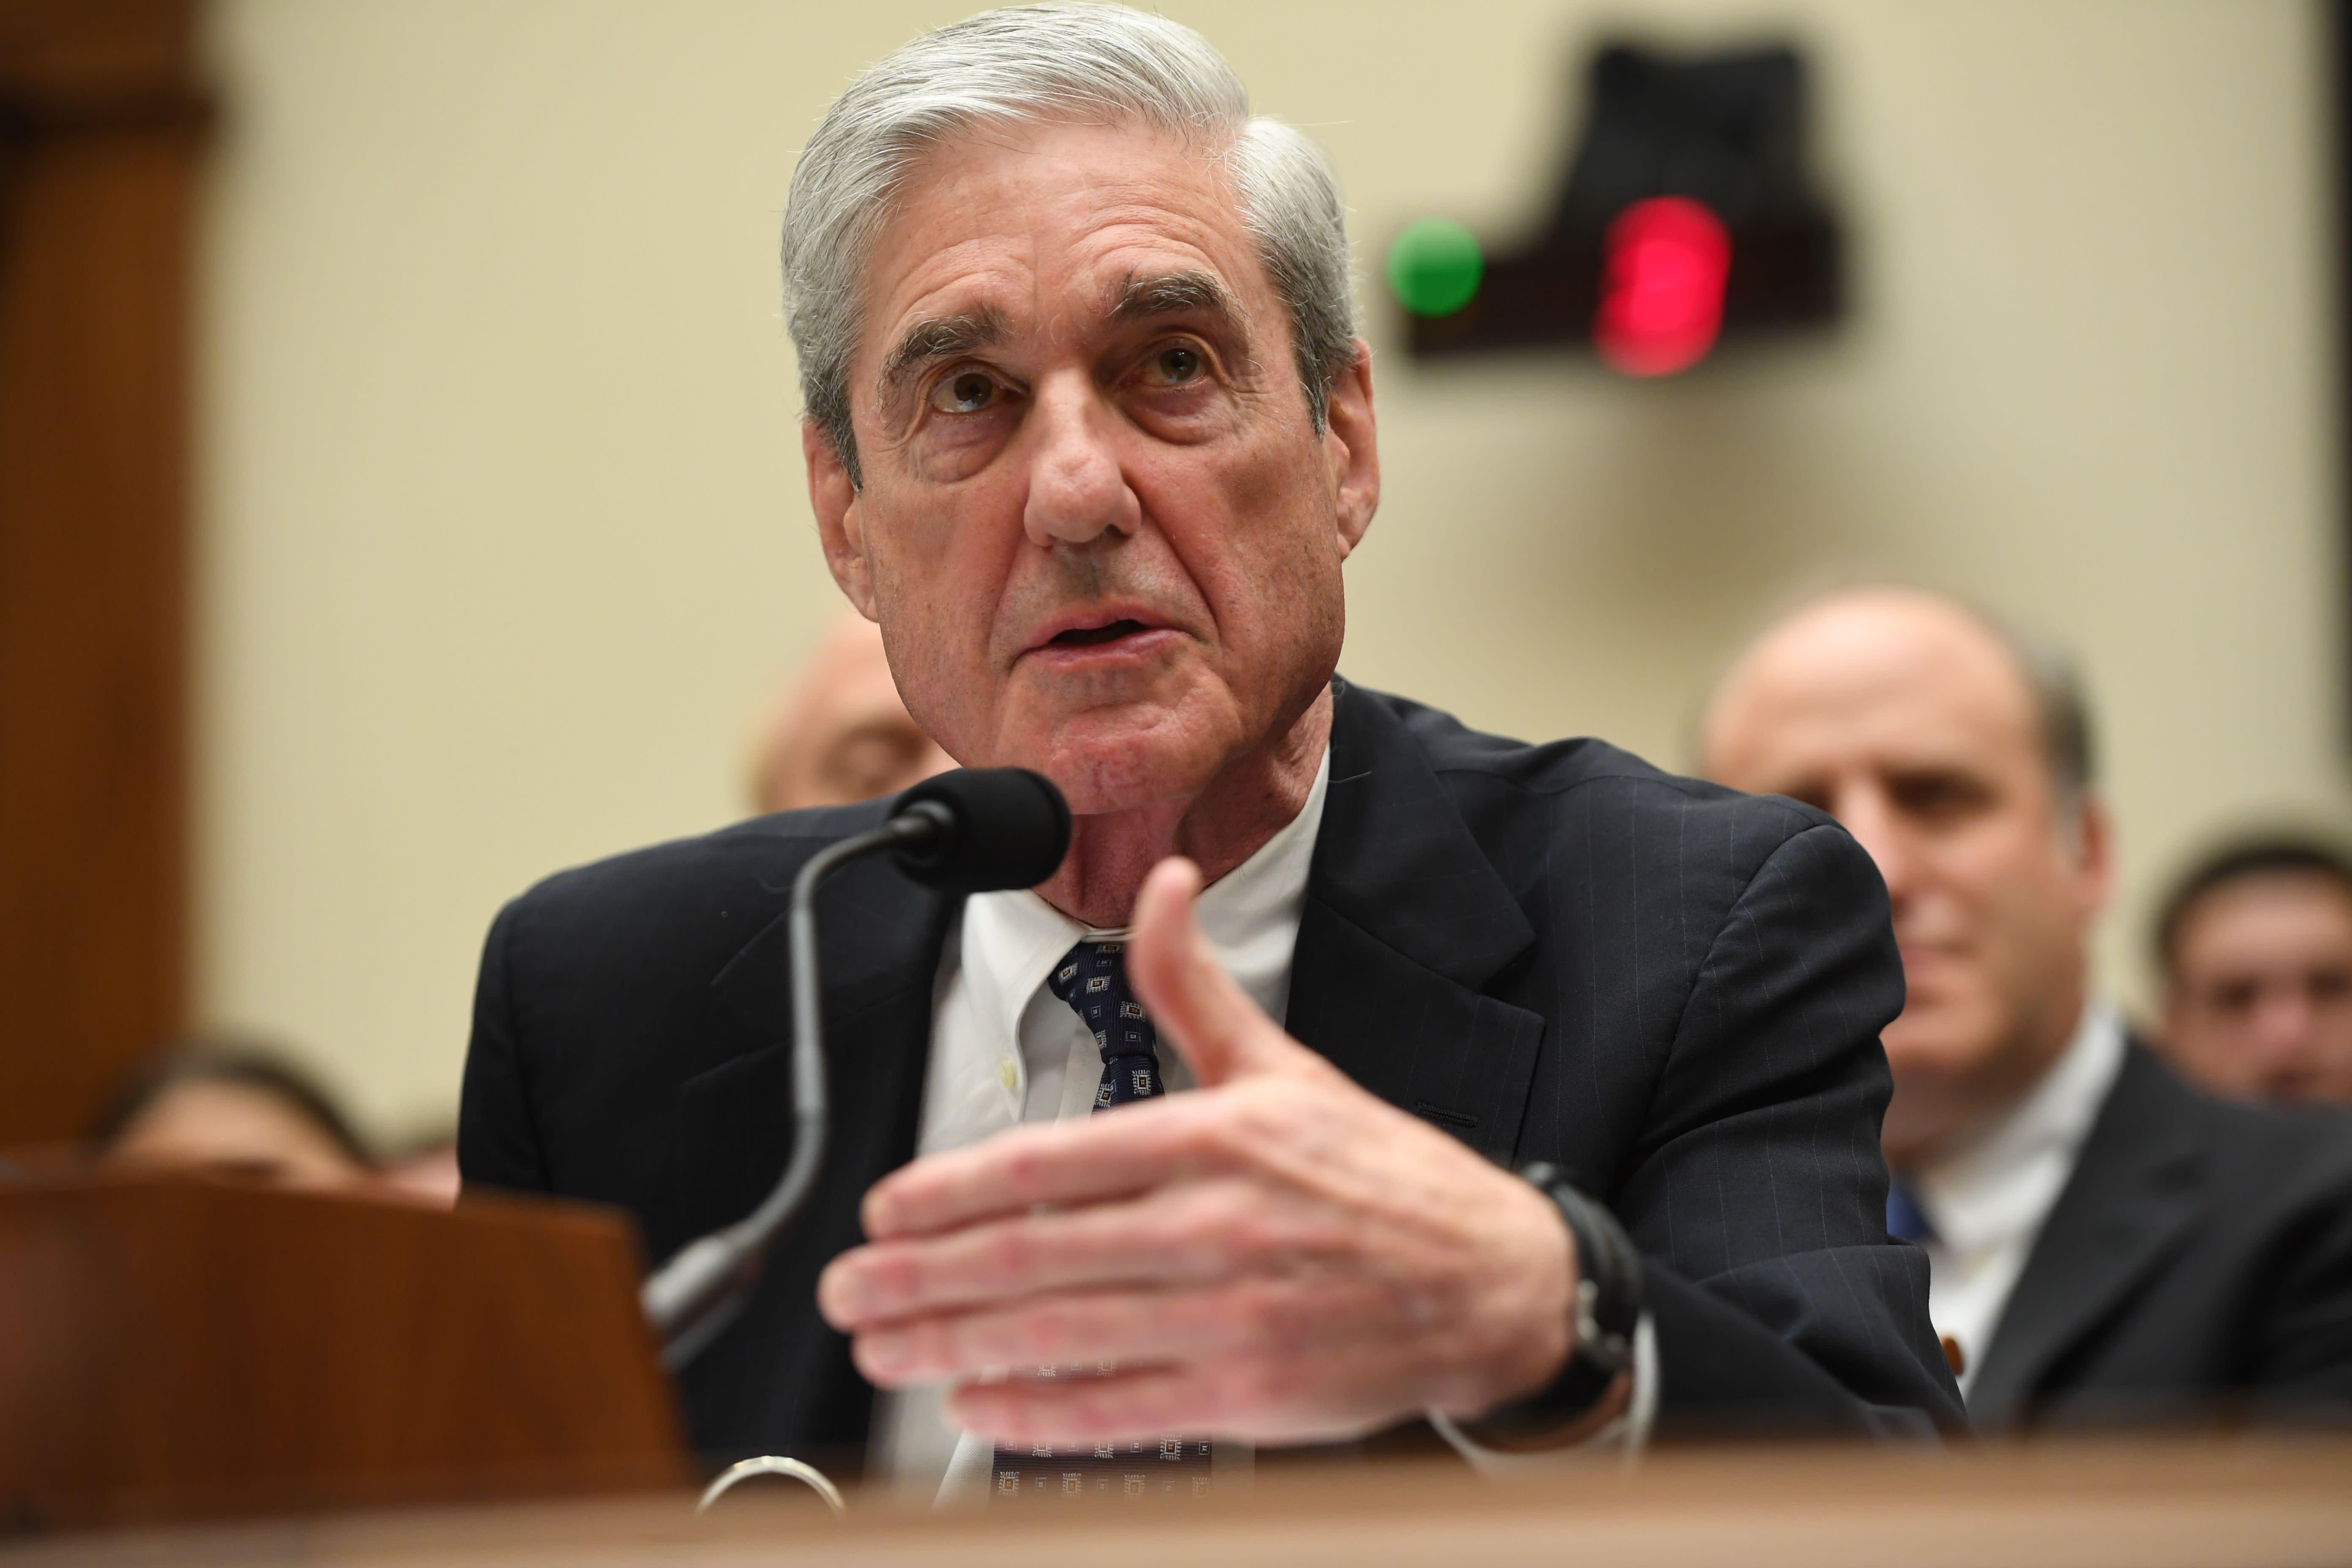 Celebrities react to Robert Mueller's testimony: 'POTUS is a criminal'